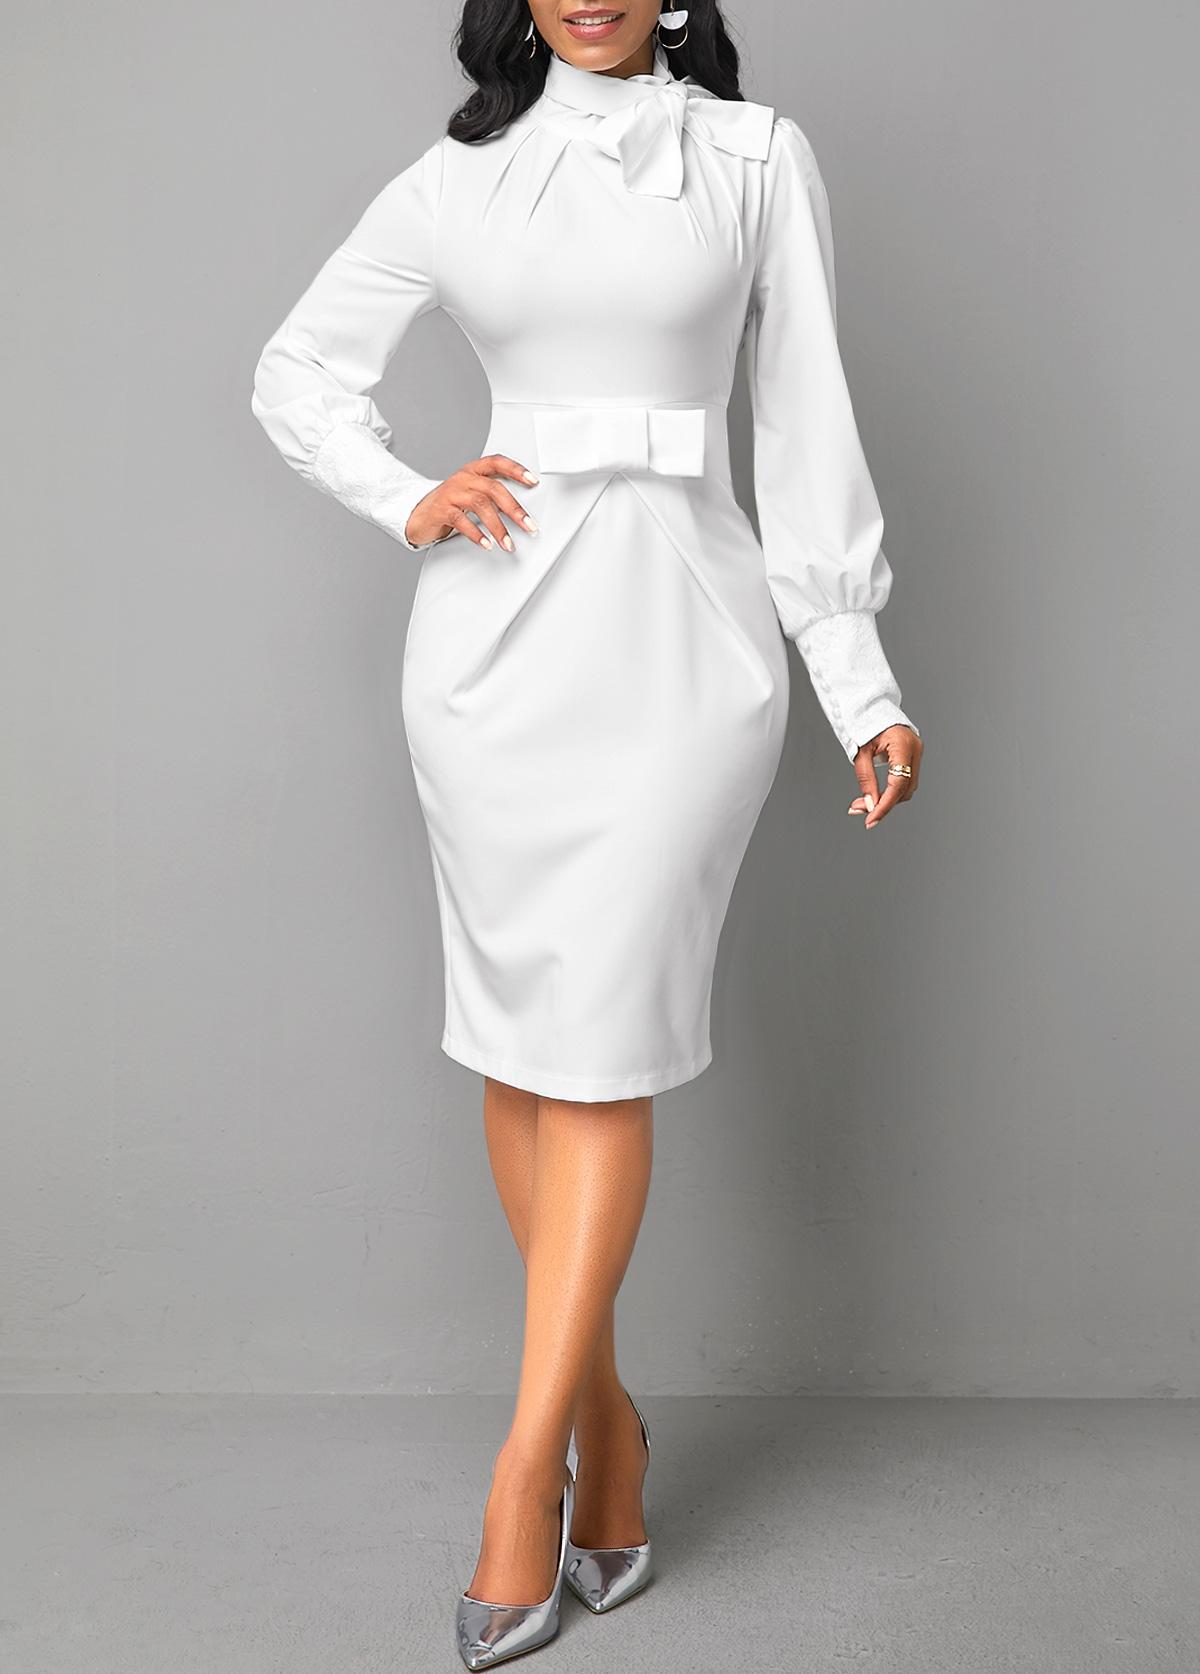 ROTITA White Bow Collar Long Sleeve Dress